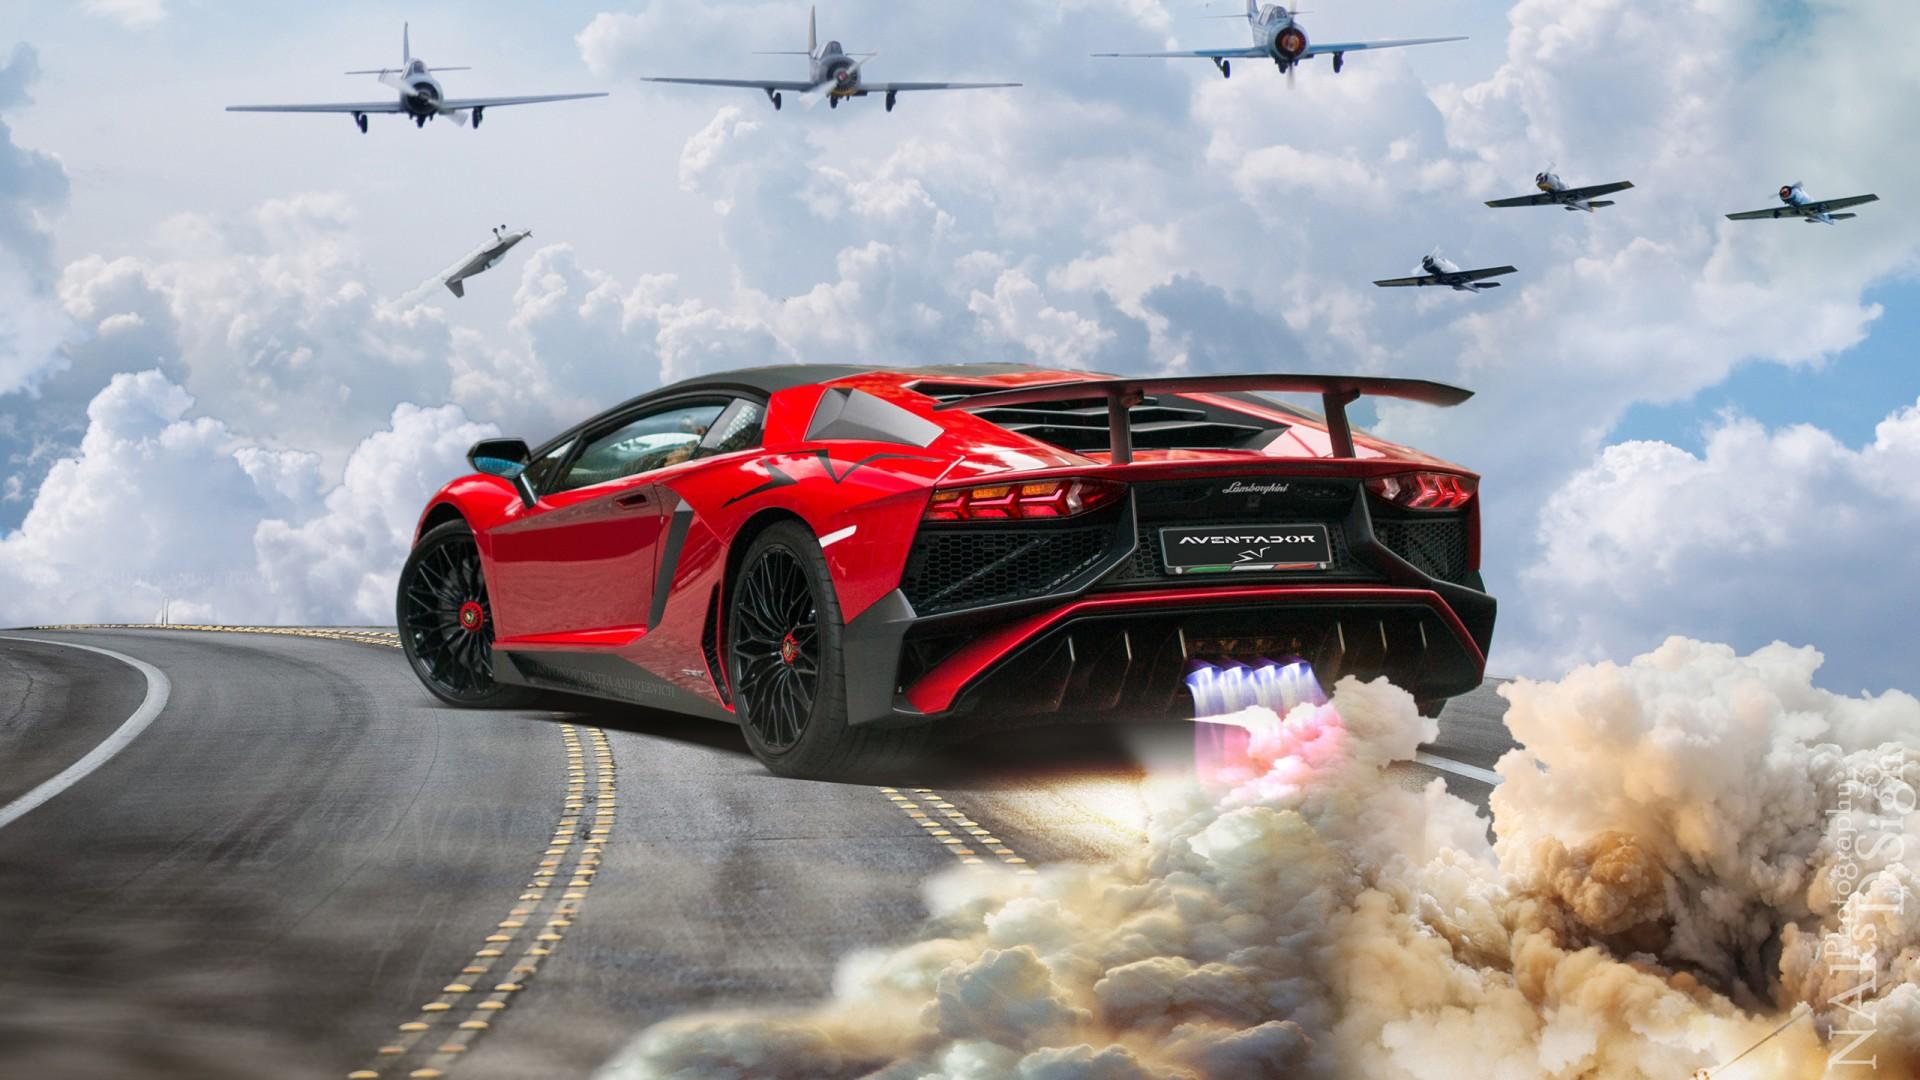 Lamborghini Cars Photos Wallpapers Lamborghini Aventador Lp 750 4 Superveloce After Space